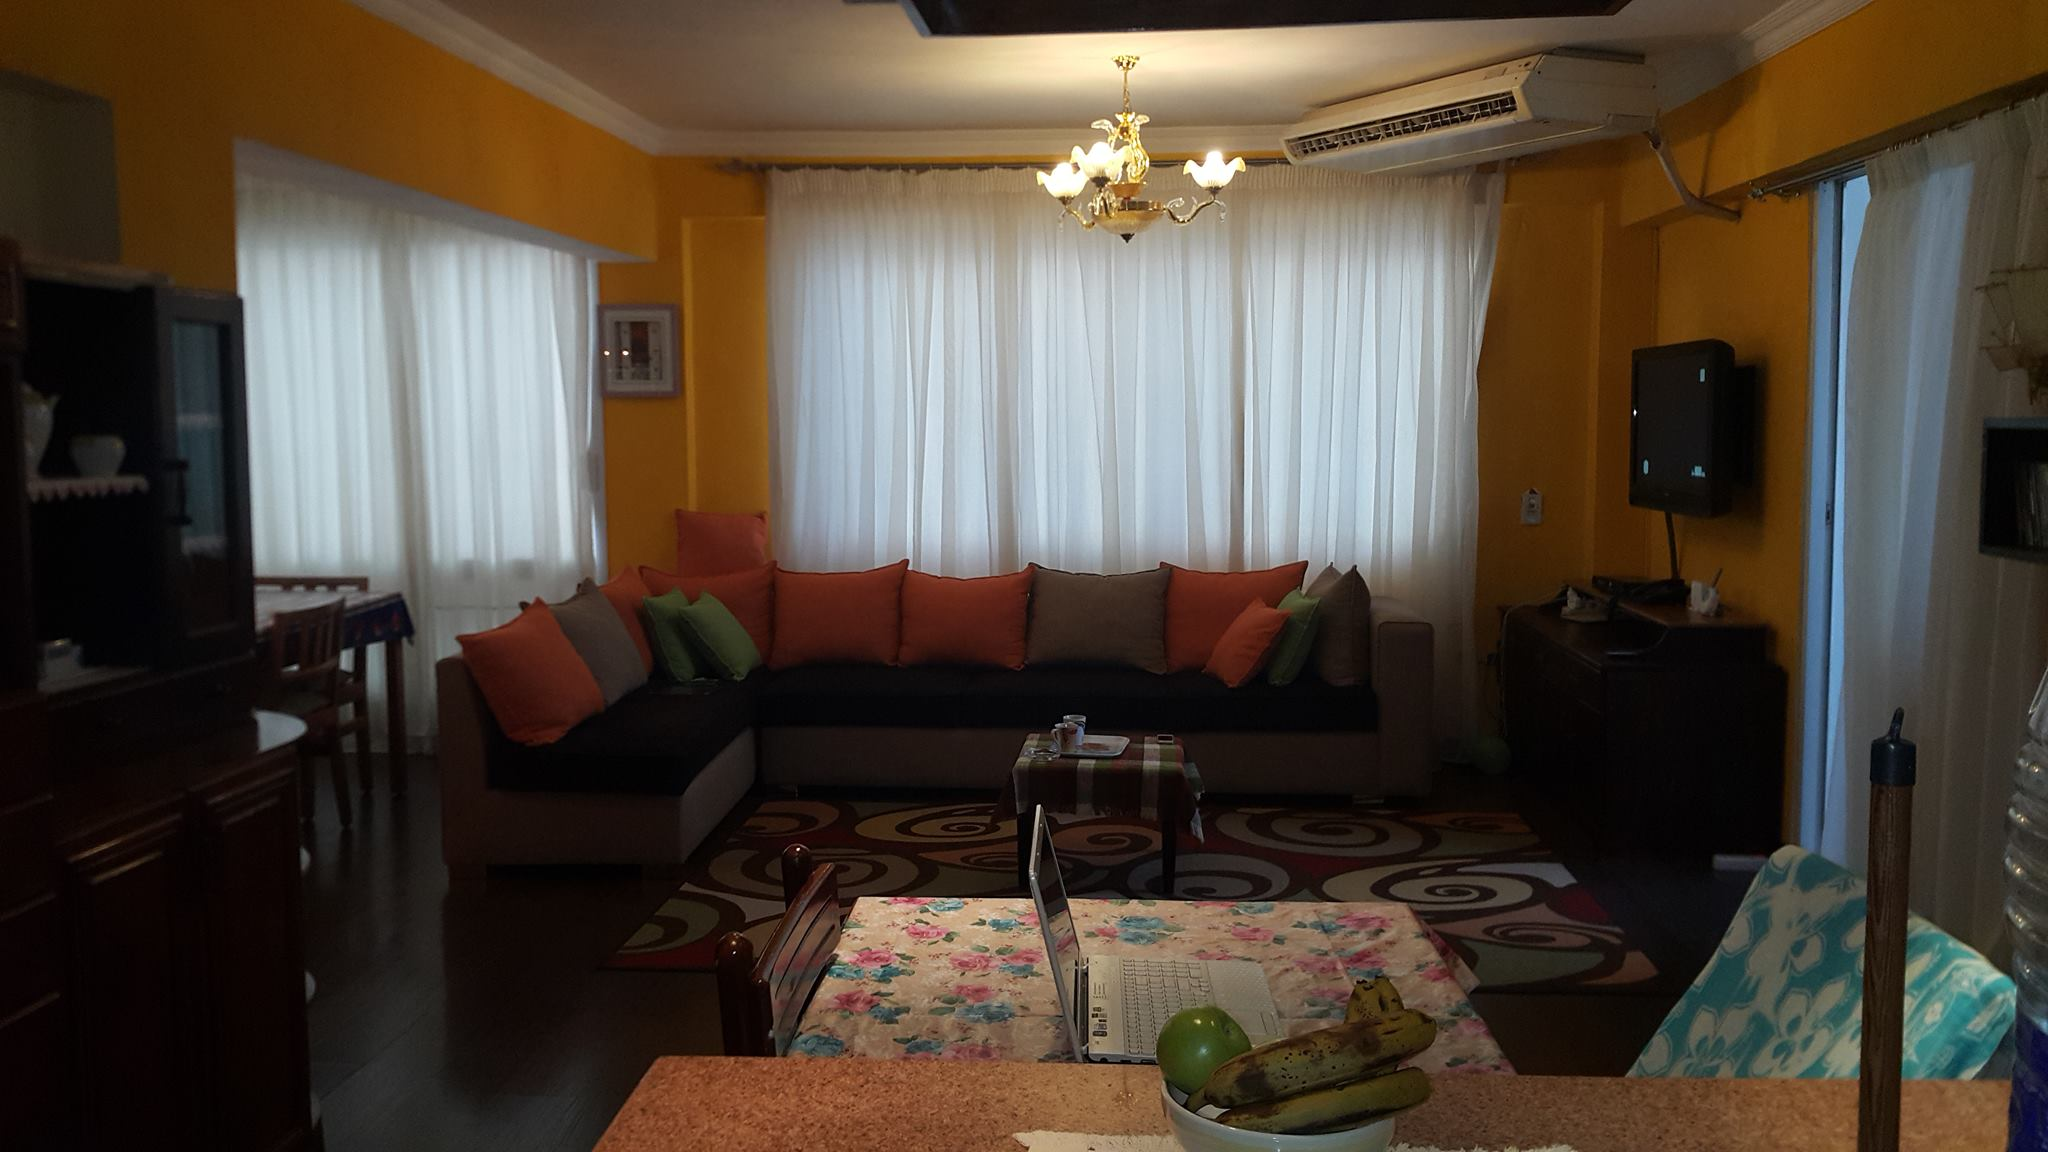 2 bedrooms for sale at elsalam naama bay